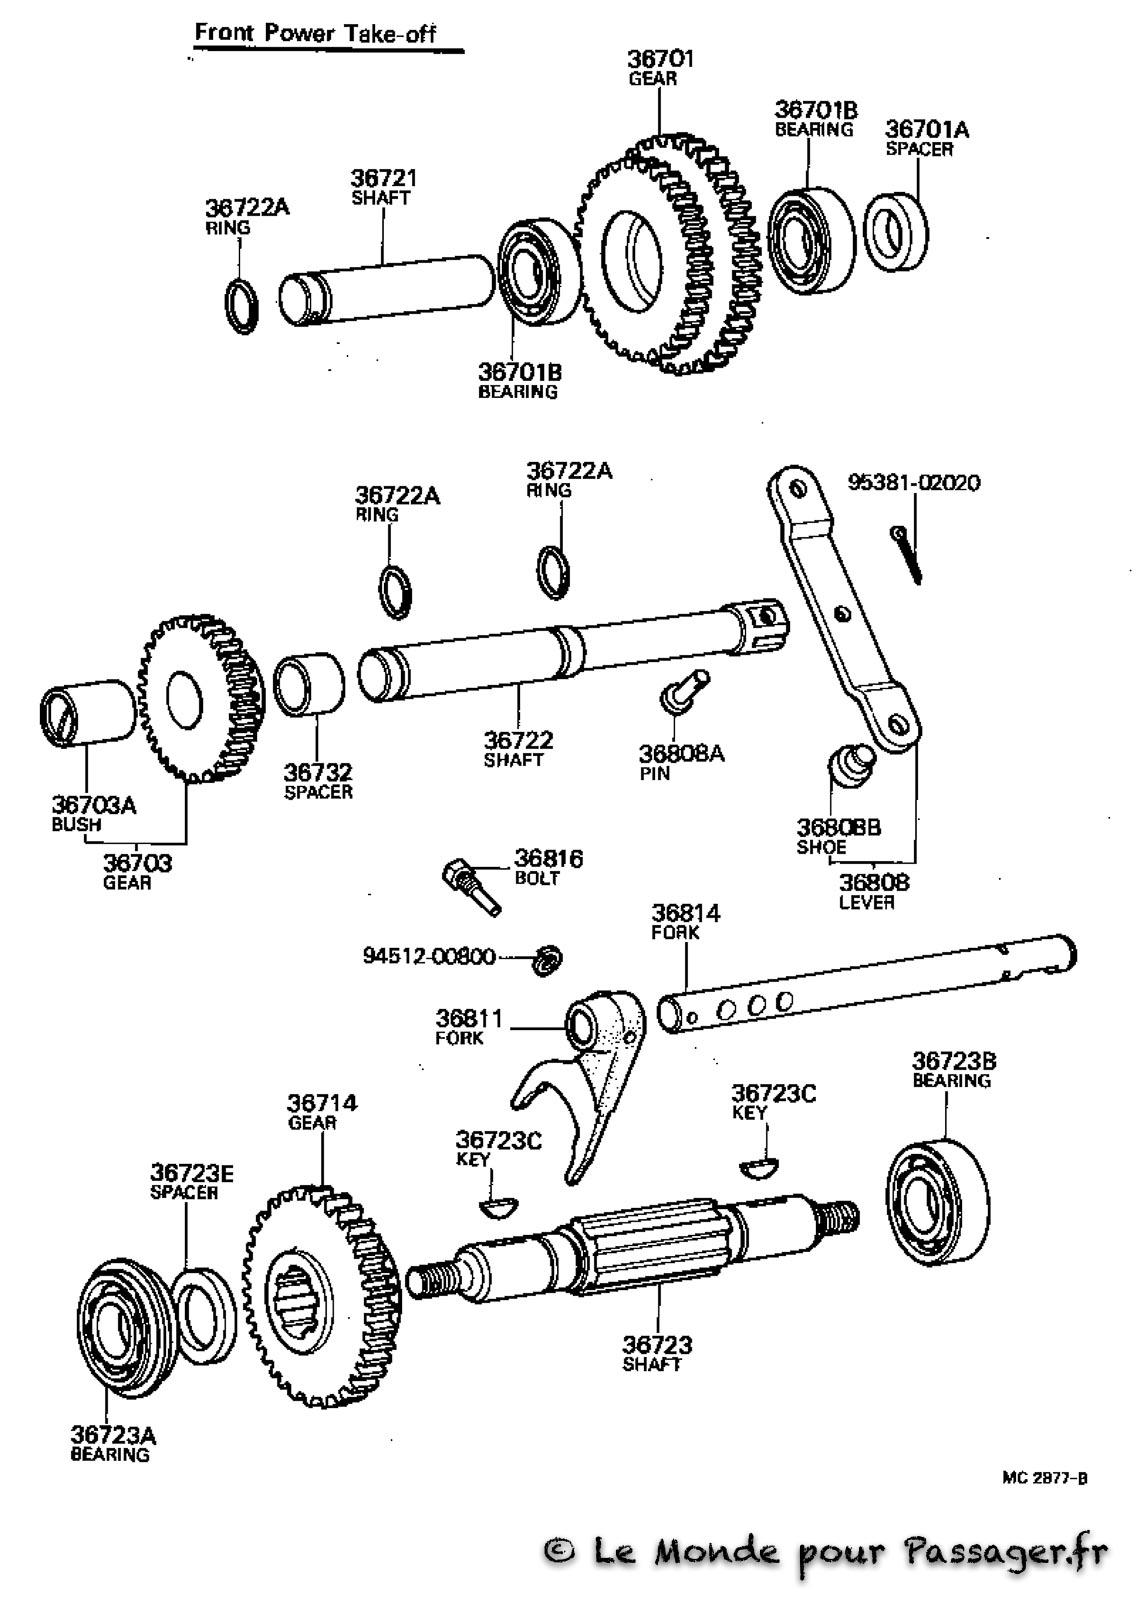 Fj55-Eclatés-Techniques107